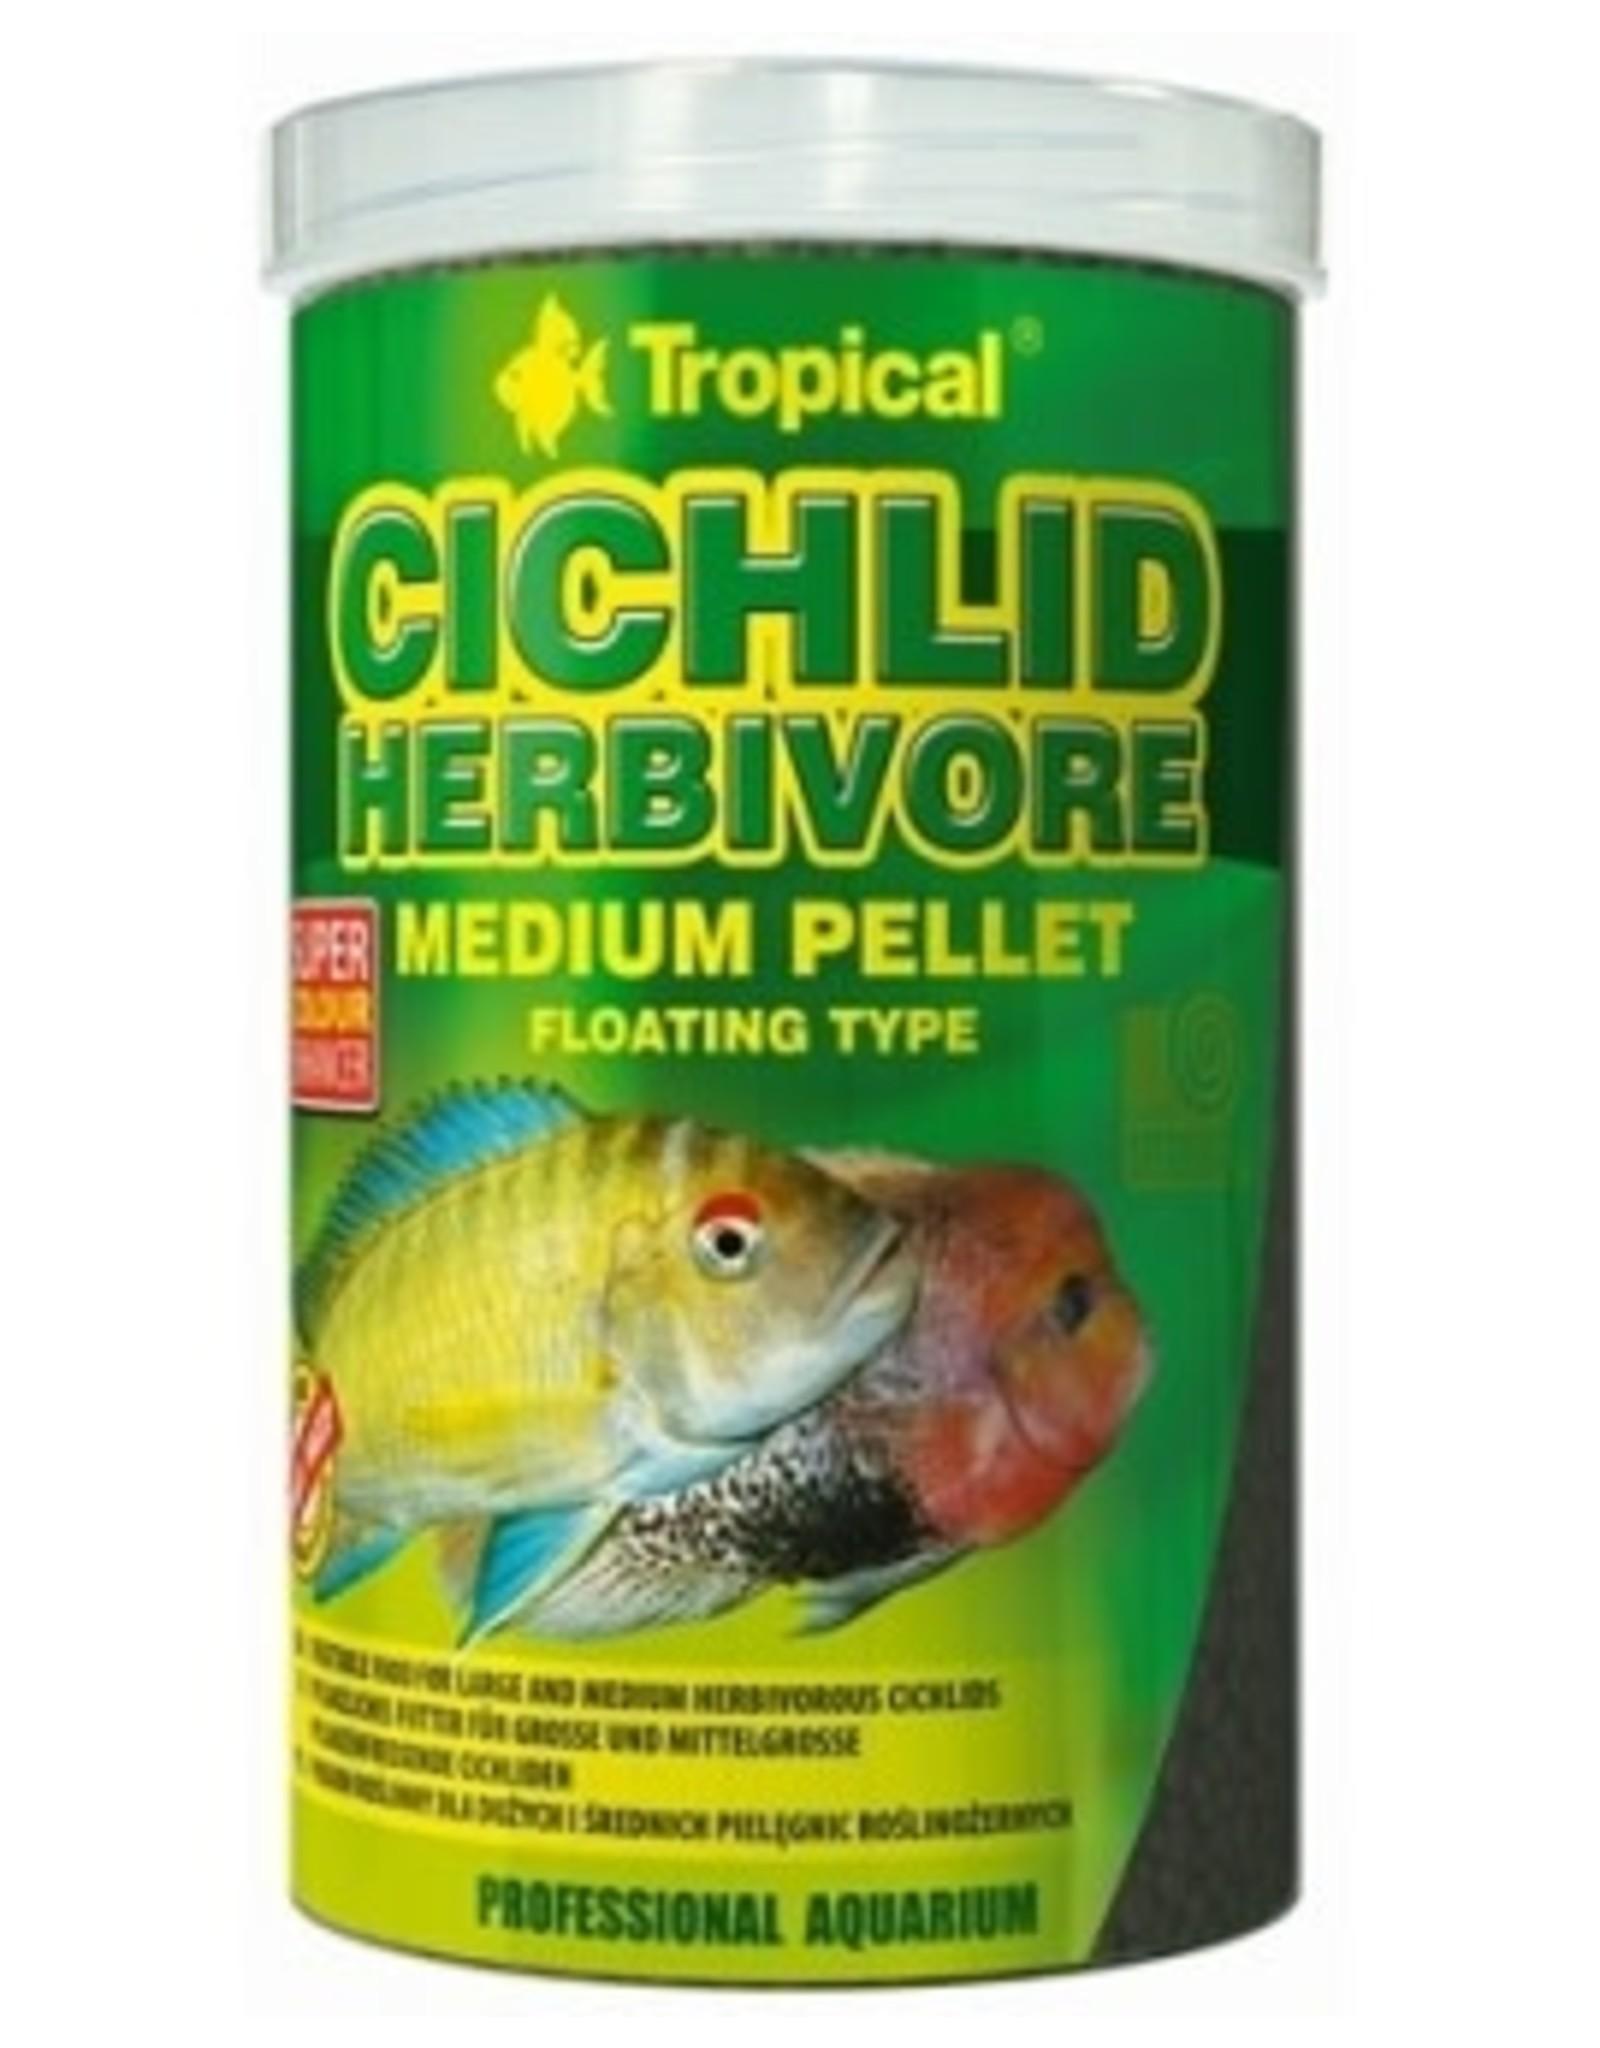 Tropical CICHLID HERBIVORE